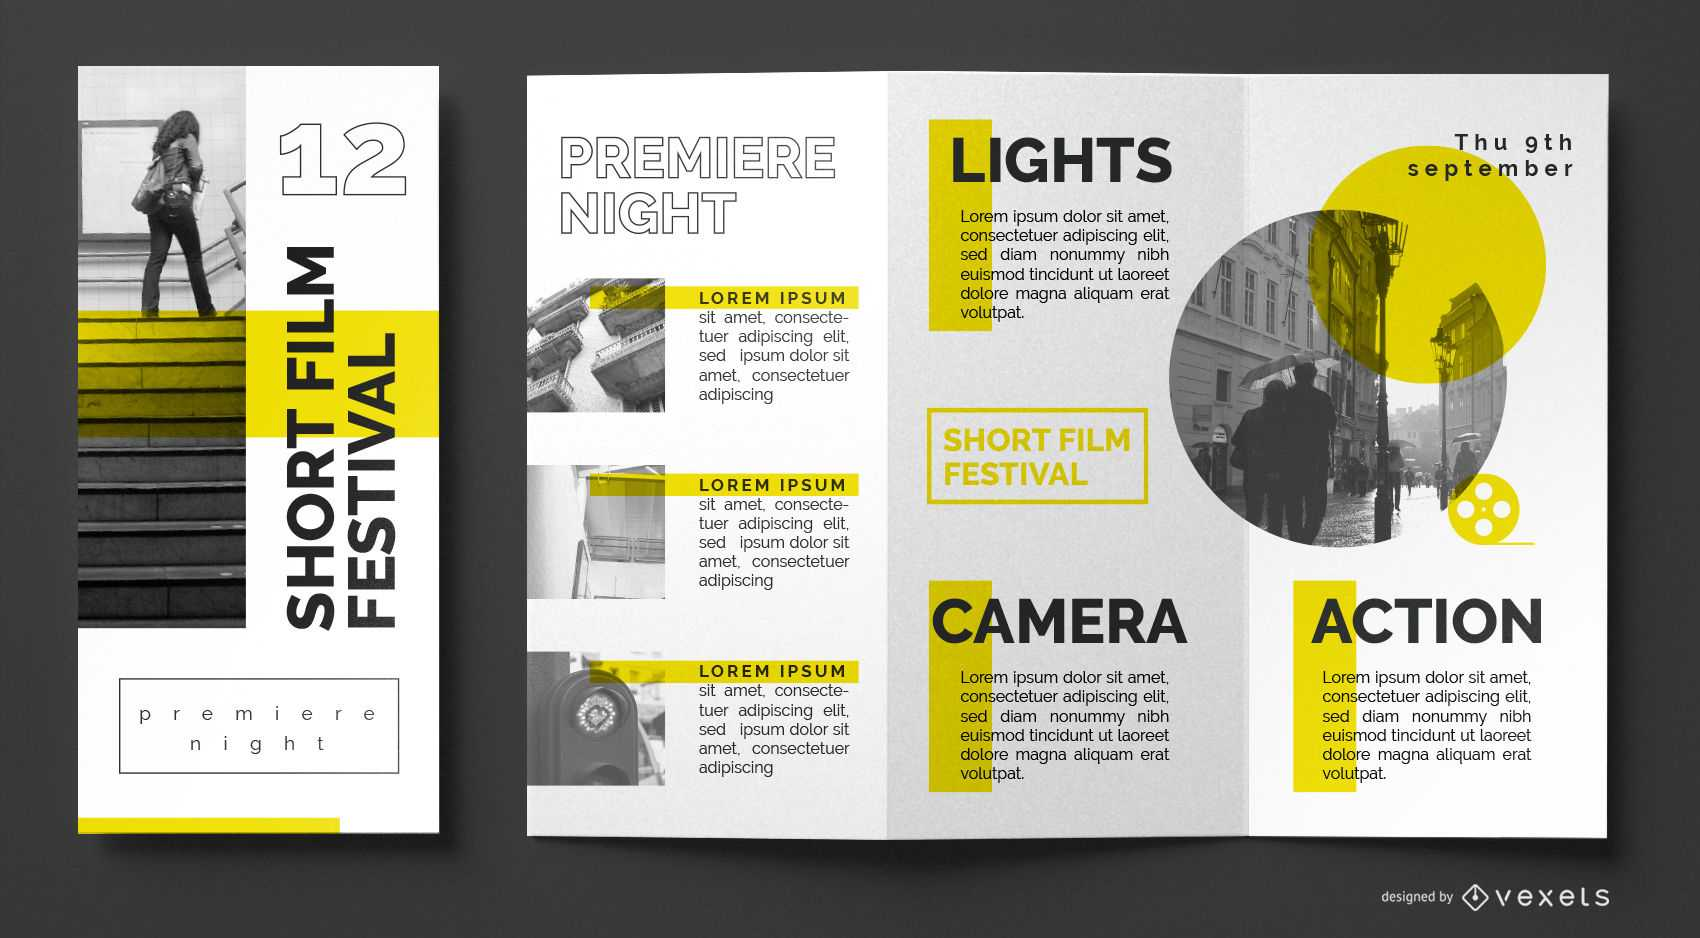 Film Festival Brochure Template - Vector Download Within Film Festival Brochure Template